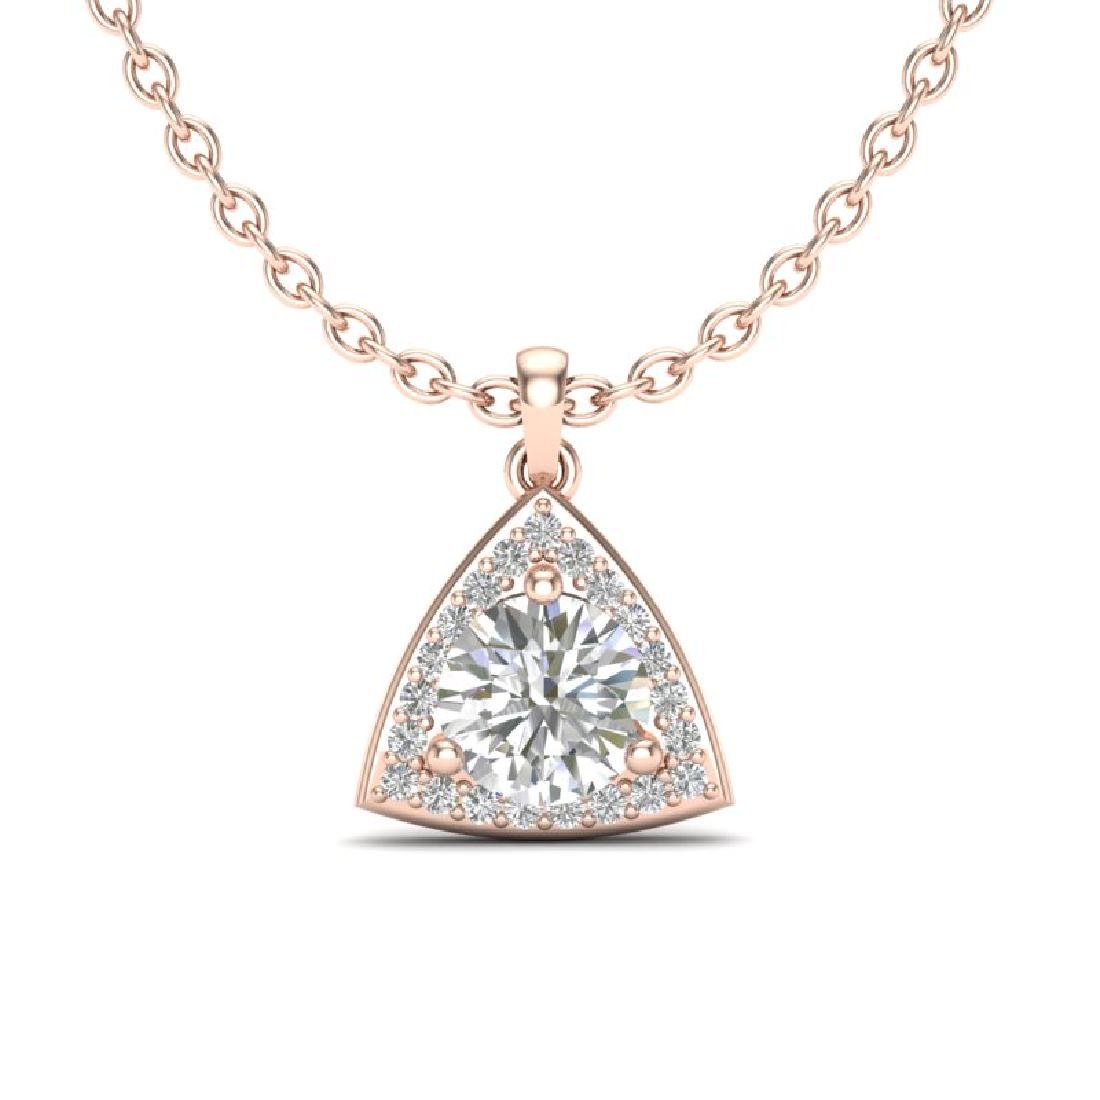 1.50 CTW VS/SI Diamond Necklace 14K Rose Gold